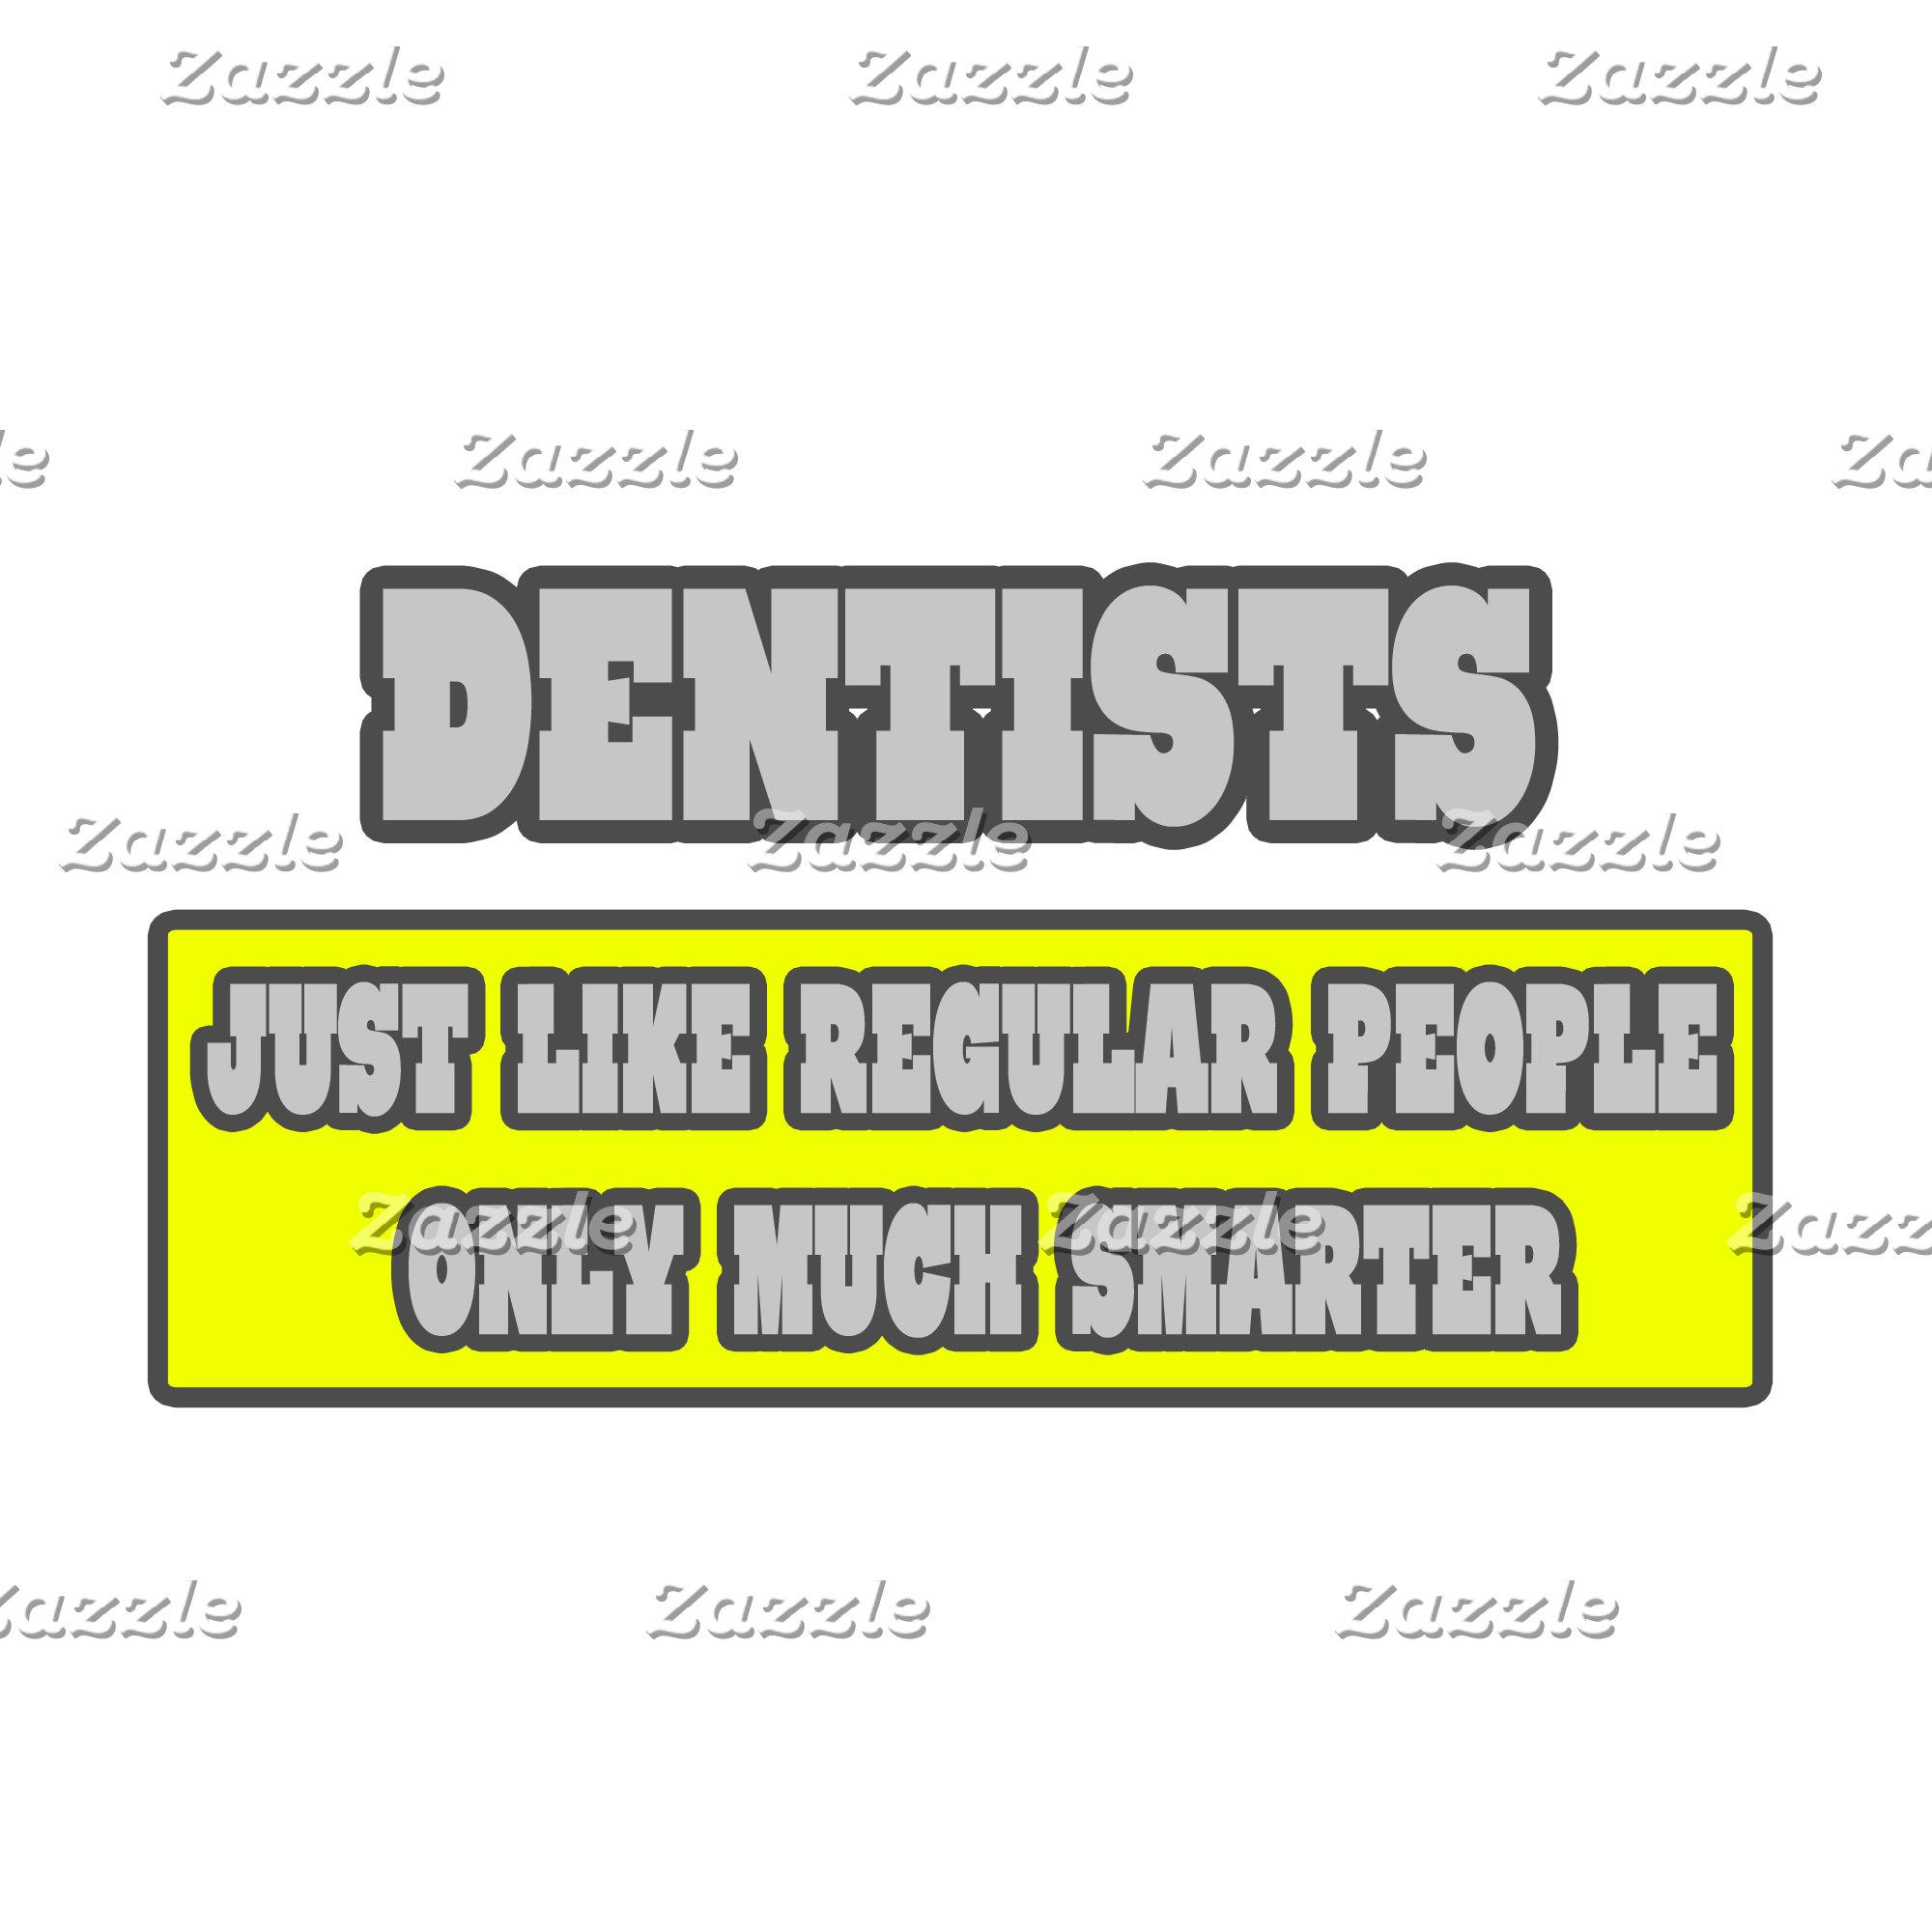 Dentists..Much Smarter